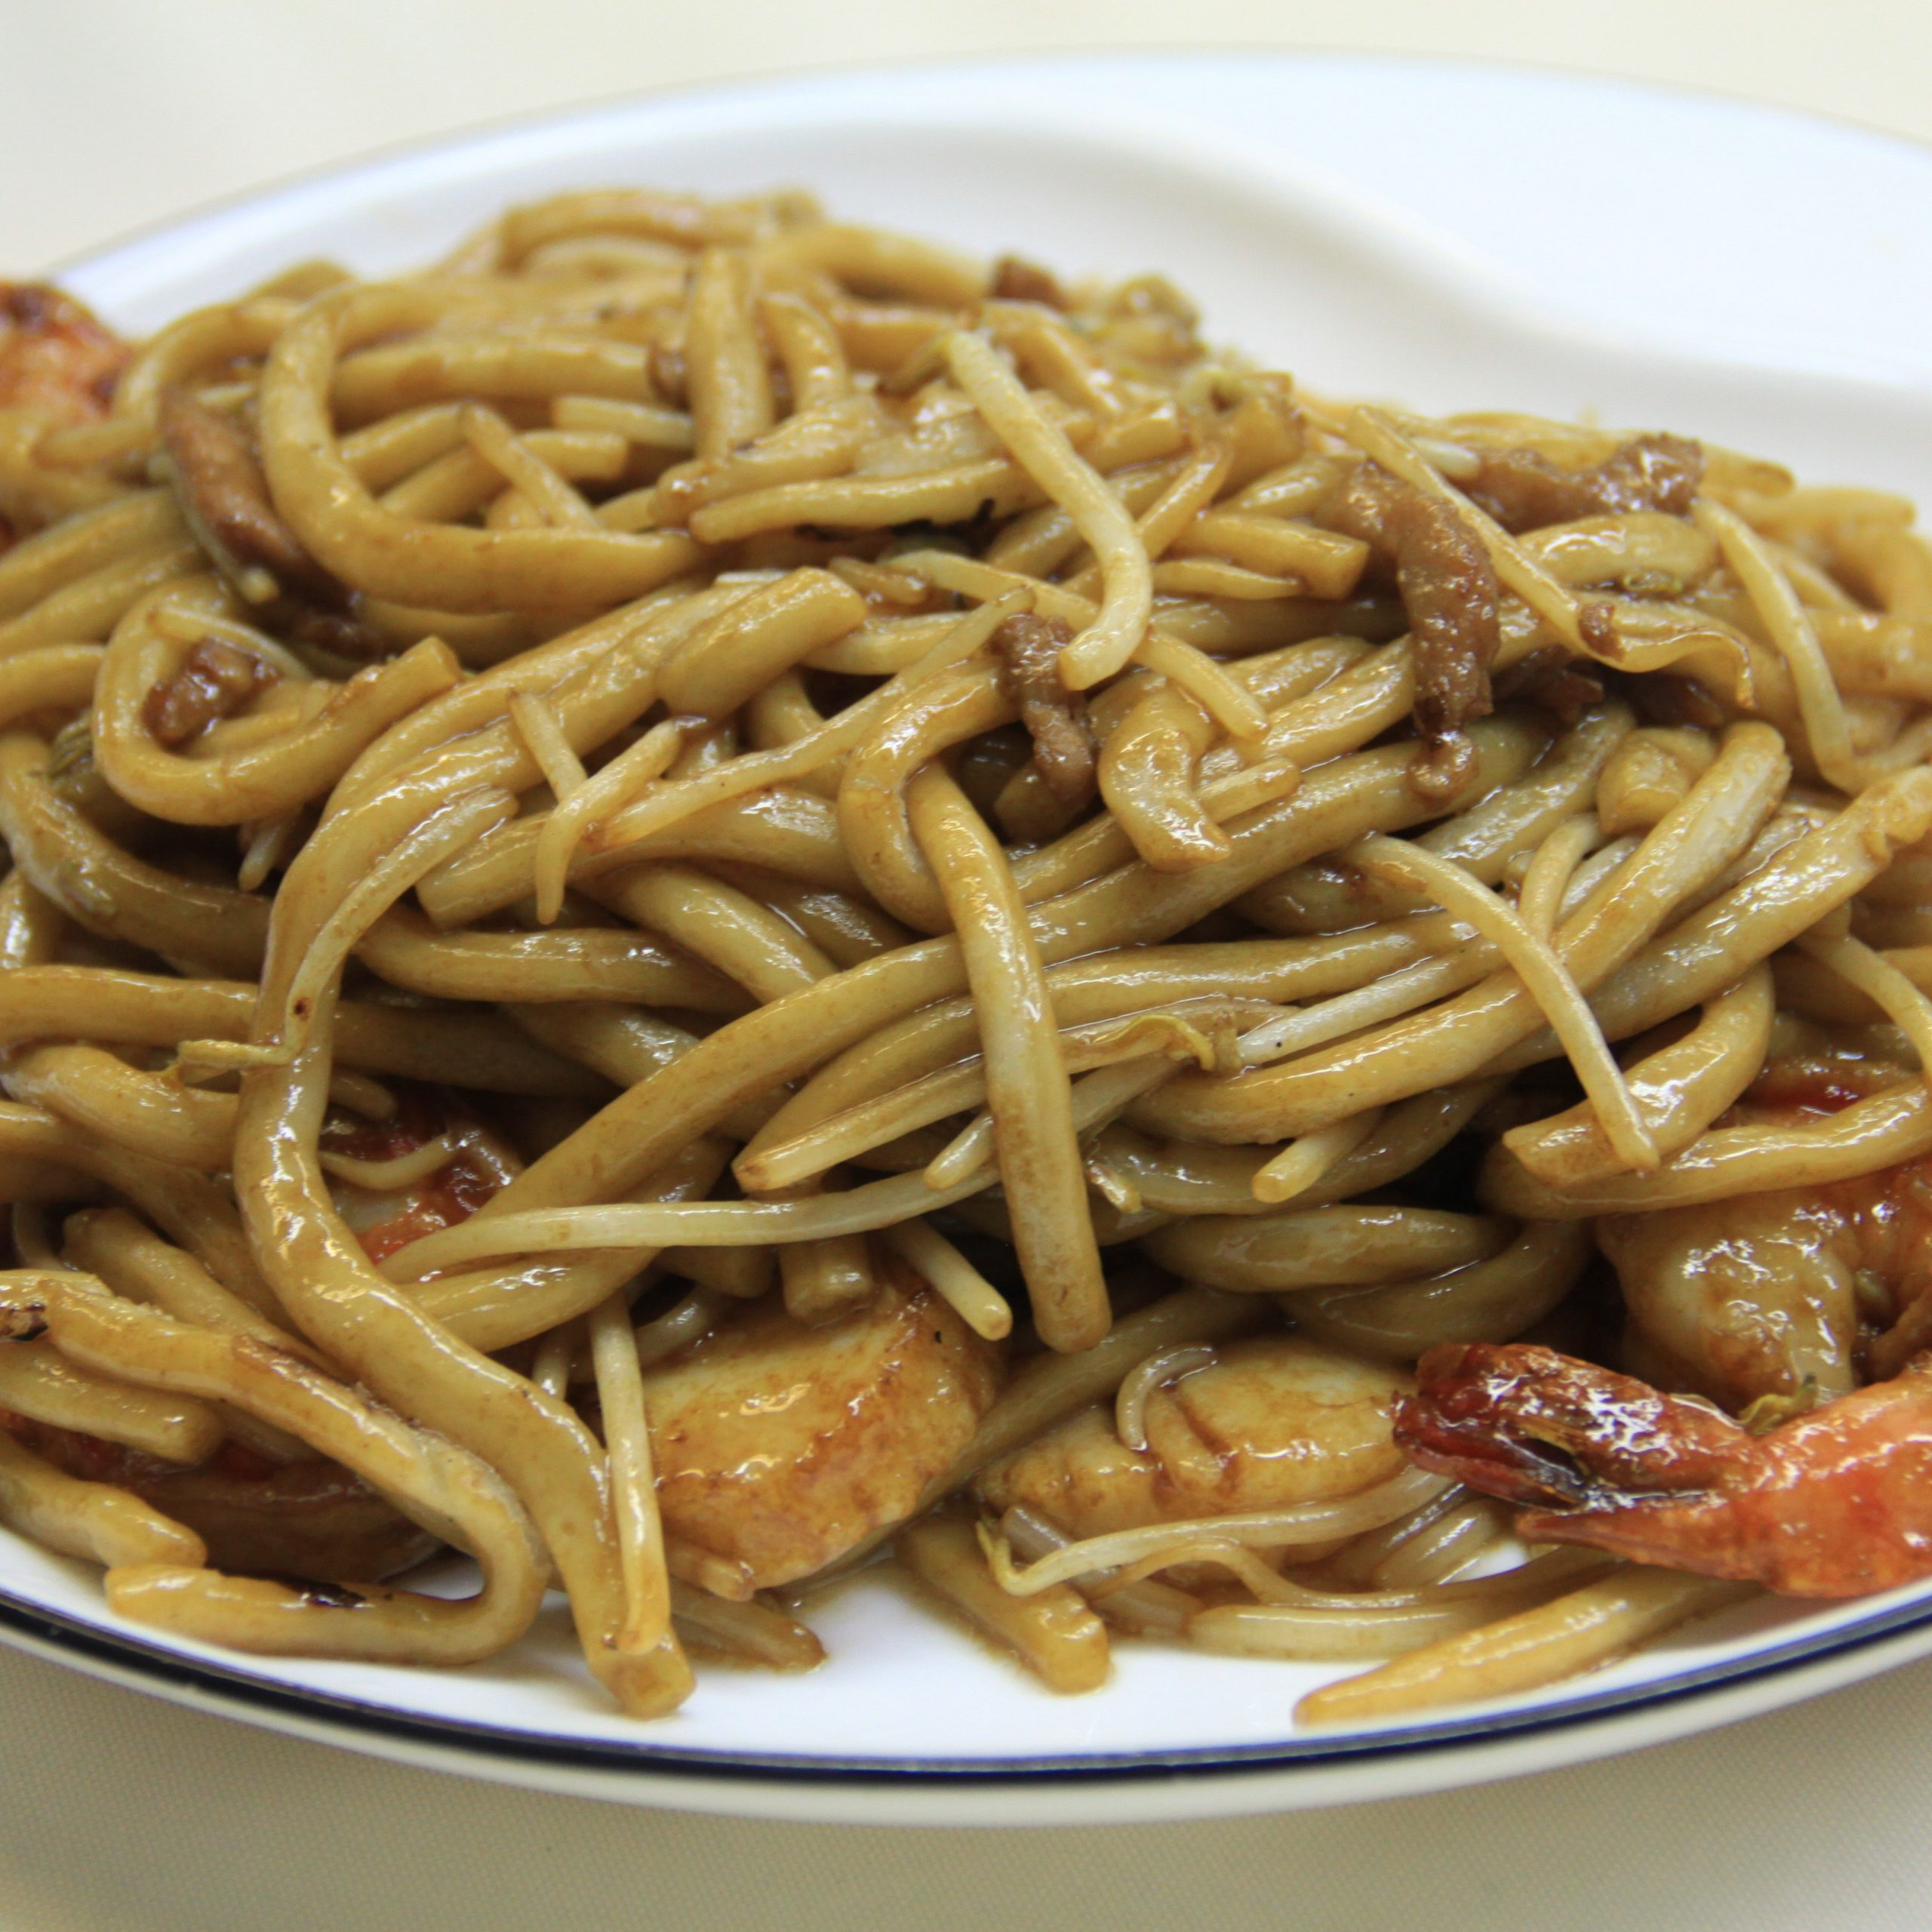 Shanghai Noodles/Vermicelli(seafood, pork)